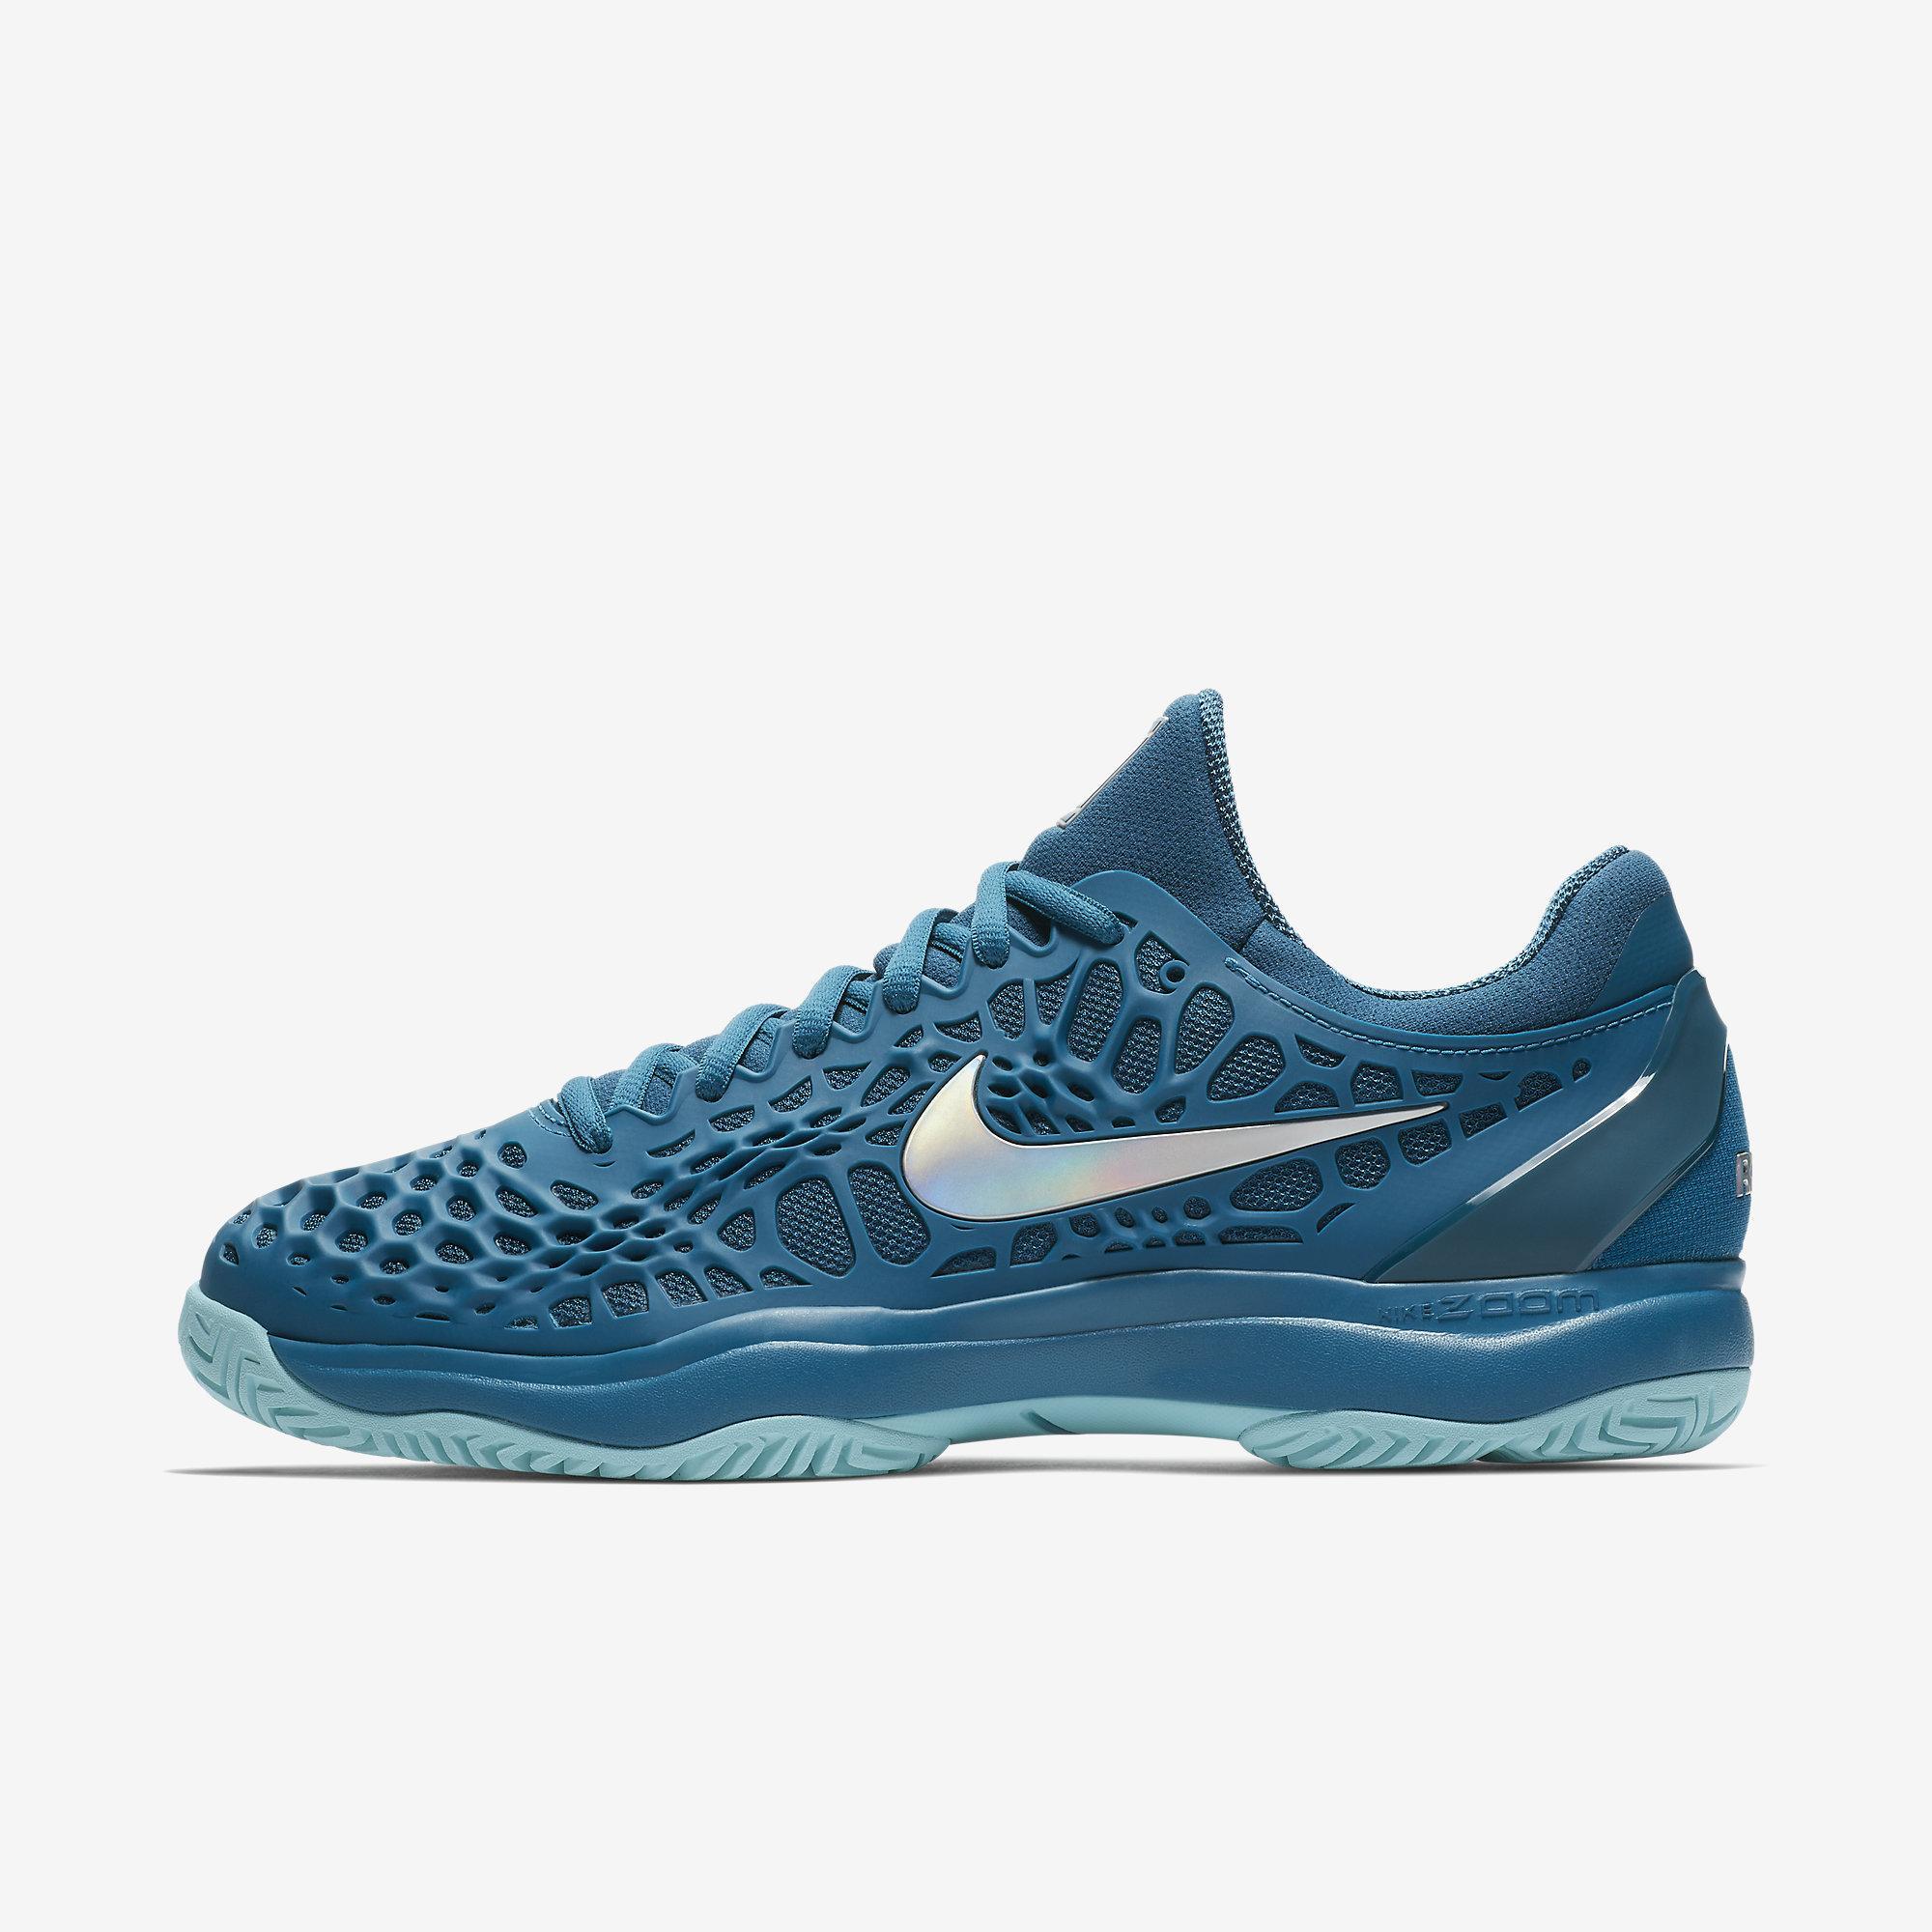 super popular 33e2a 085eb Nike Mens Zoom Cage 3 Rafa Tennis Shoes - Green Abyss Metallic Silver -  Tennisnuts.com